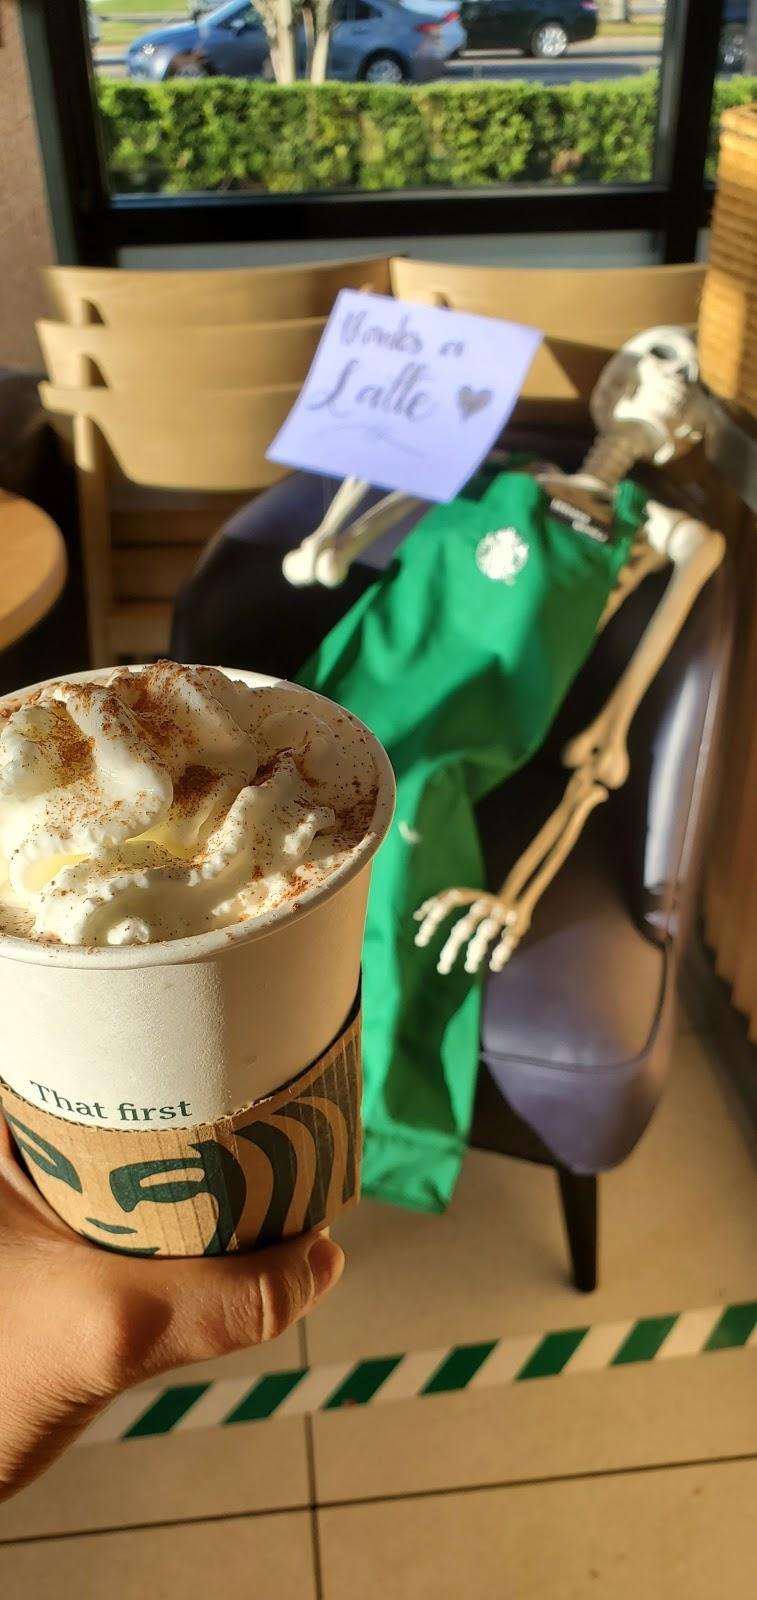 Starbucks - cafe  | Photo 4 of 10 | Address: 2914 Little Rd, Trinity, FL 34655, USA | Phone: (727) 375-0163